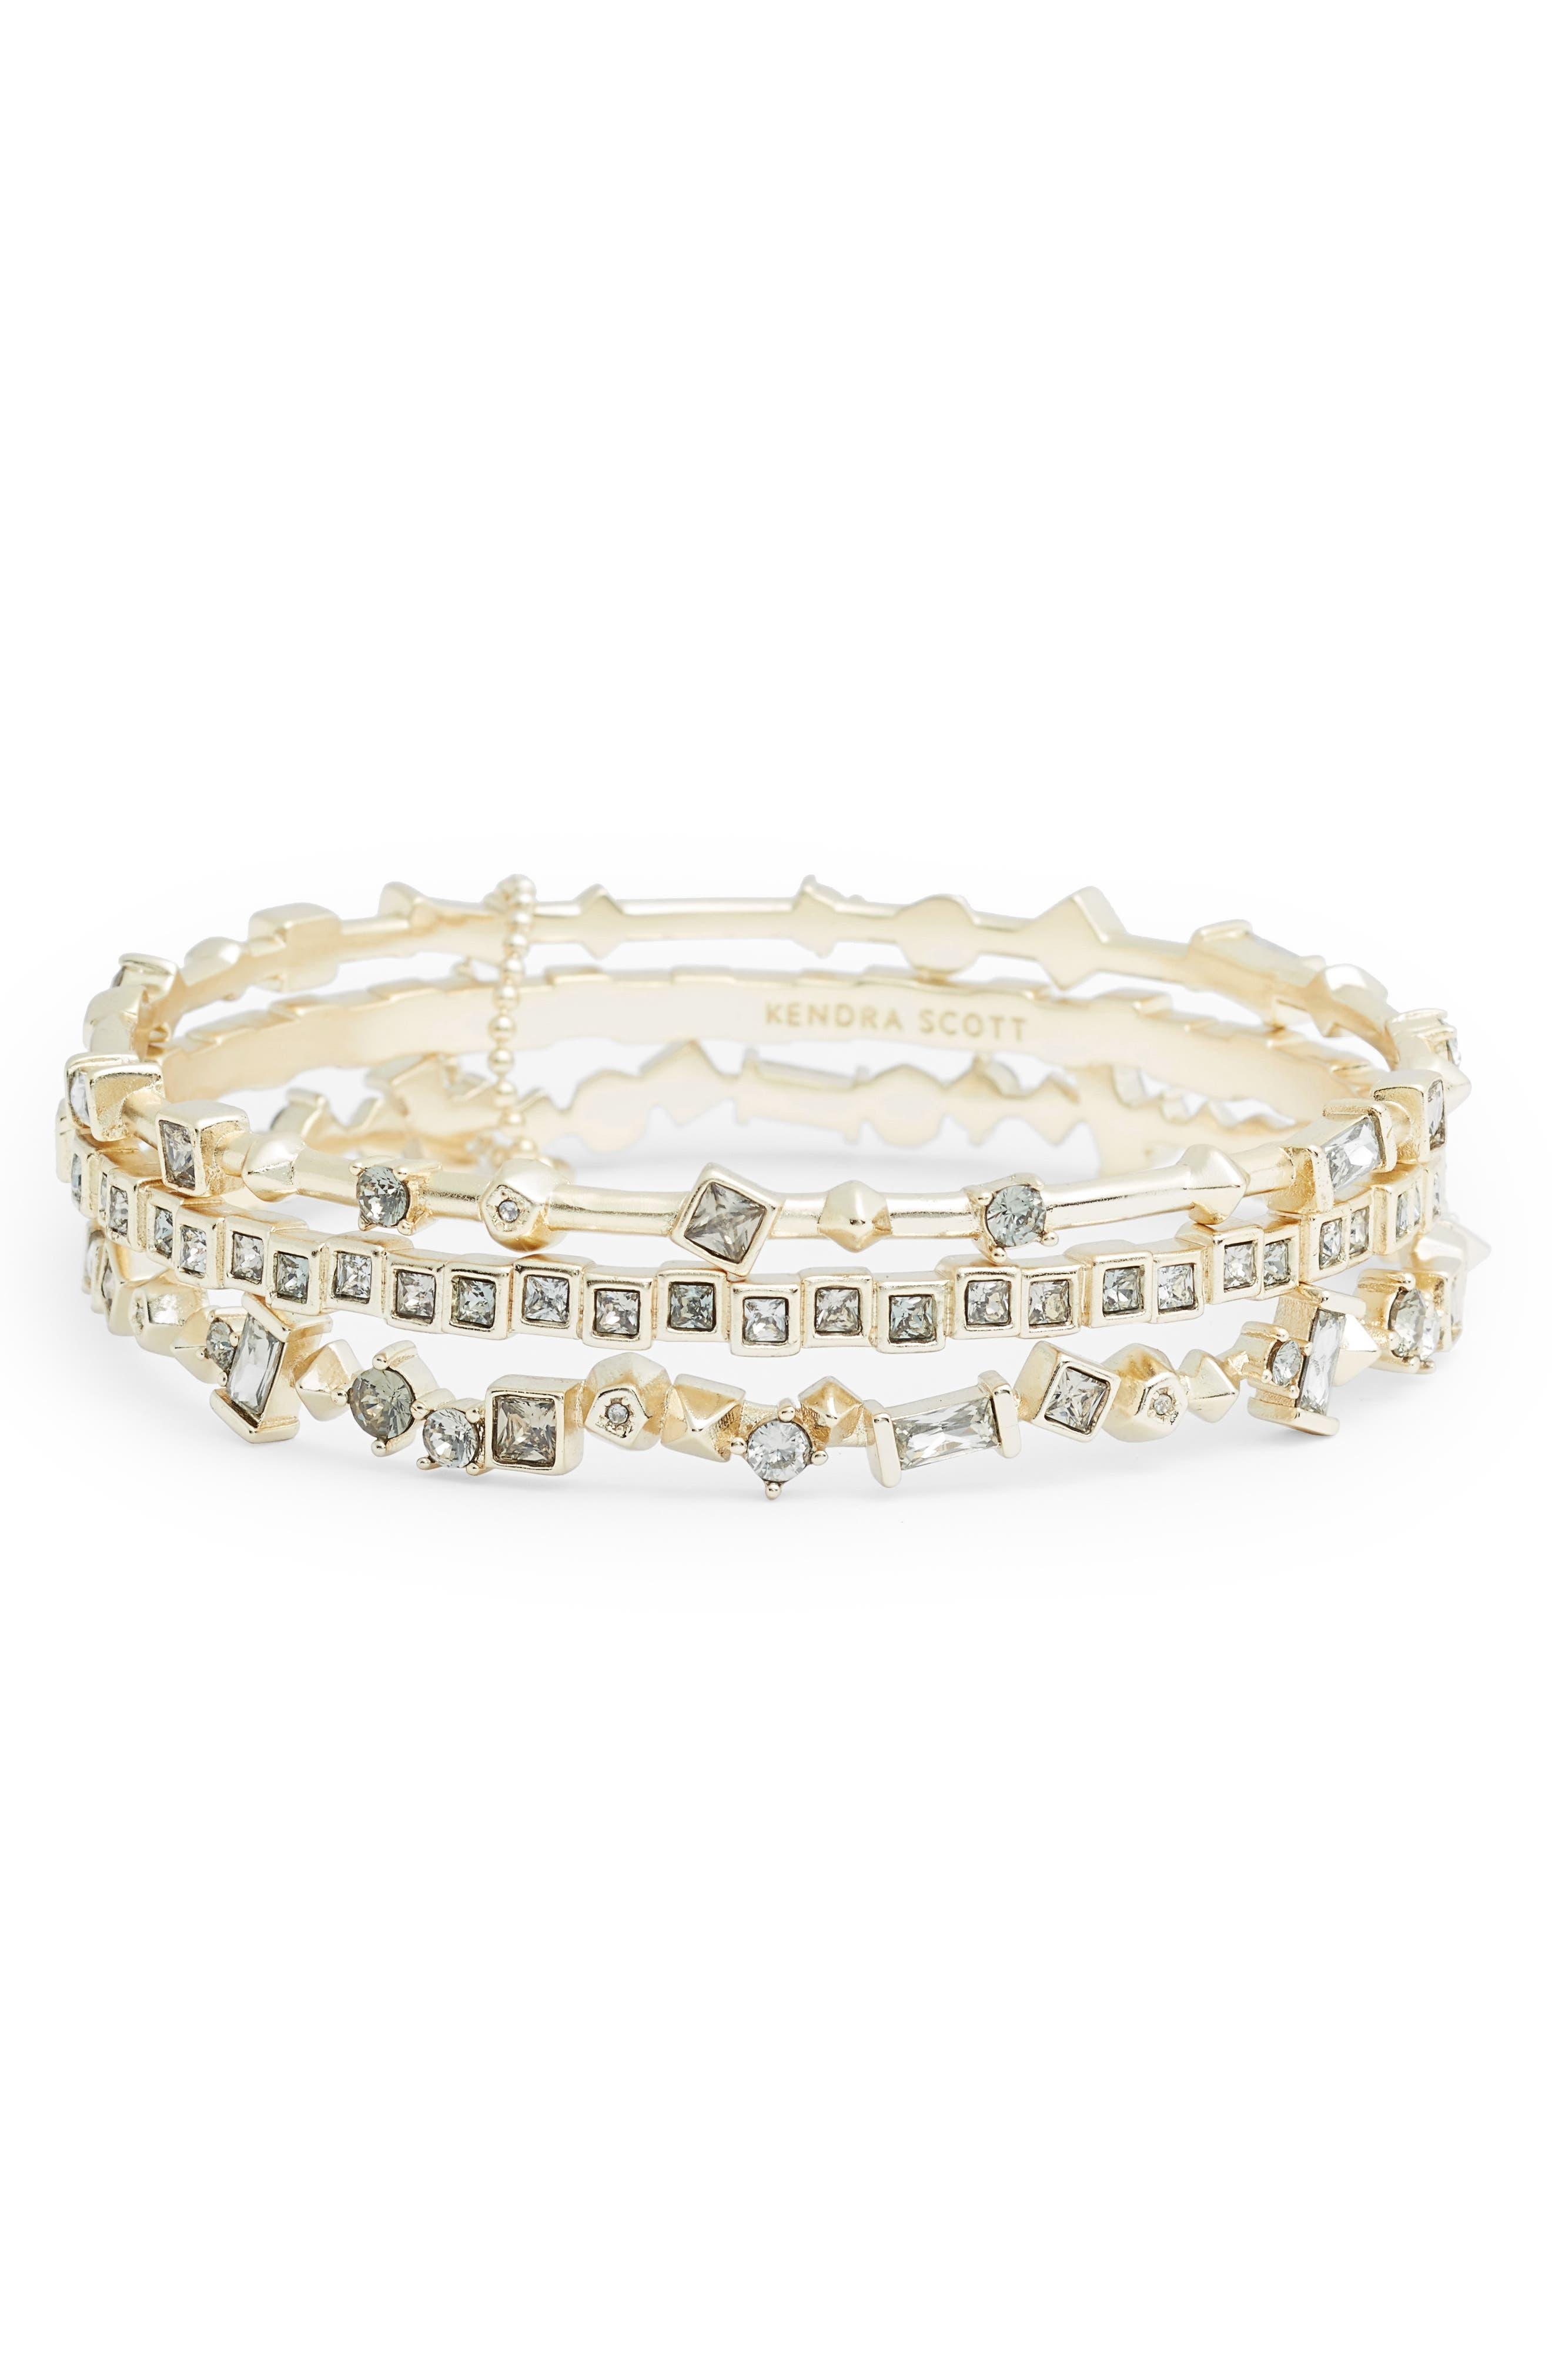 Malia Set of 3 Bracelets,                             Main thumbnail 1, color,                             020